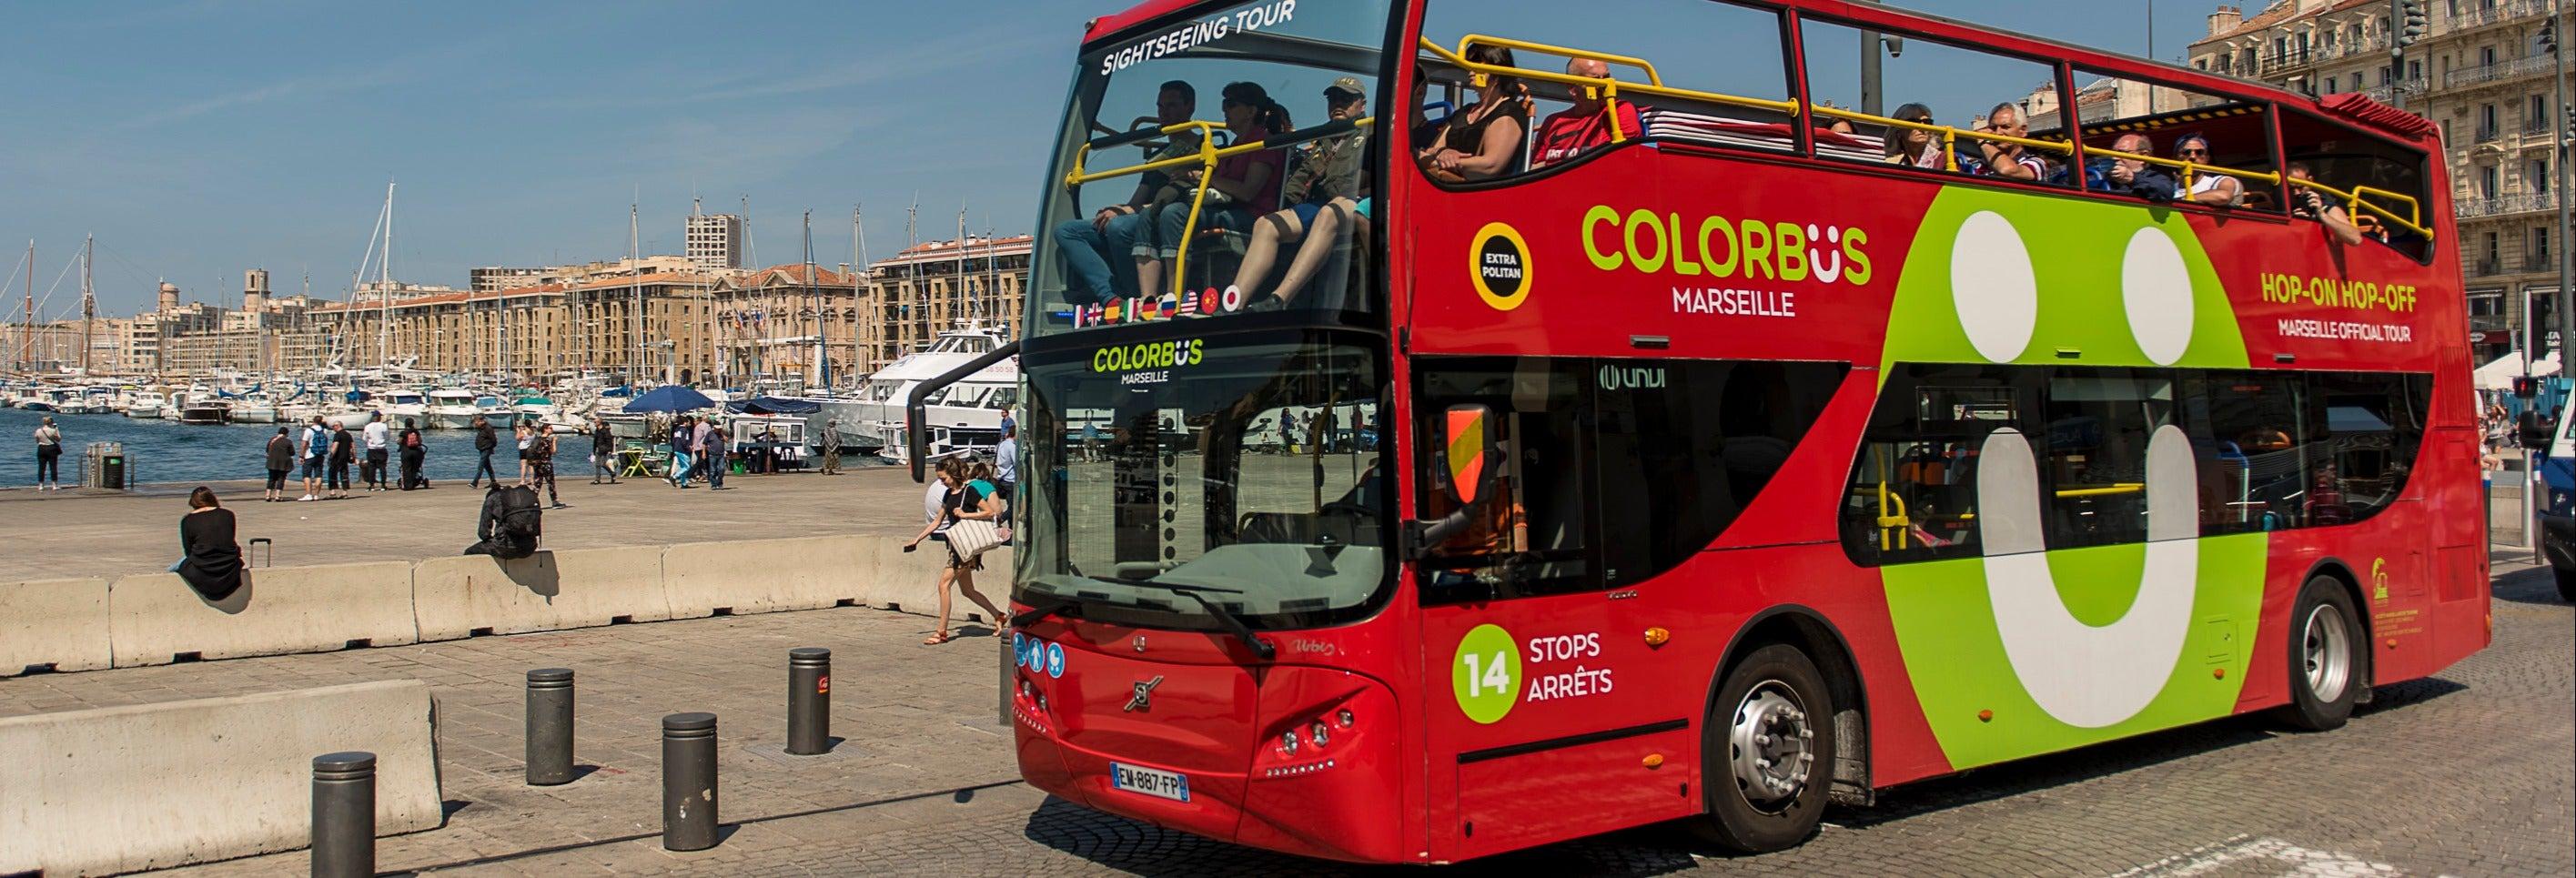 Ônibus turístico de Marselha